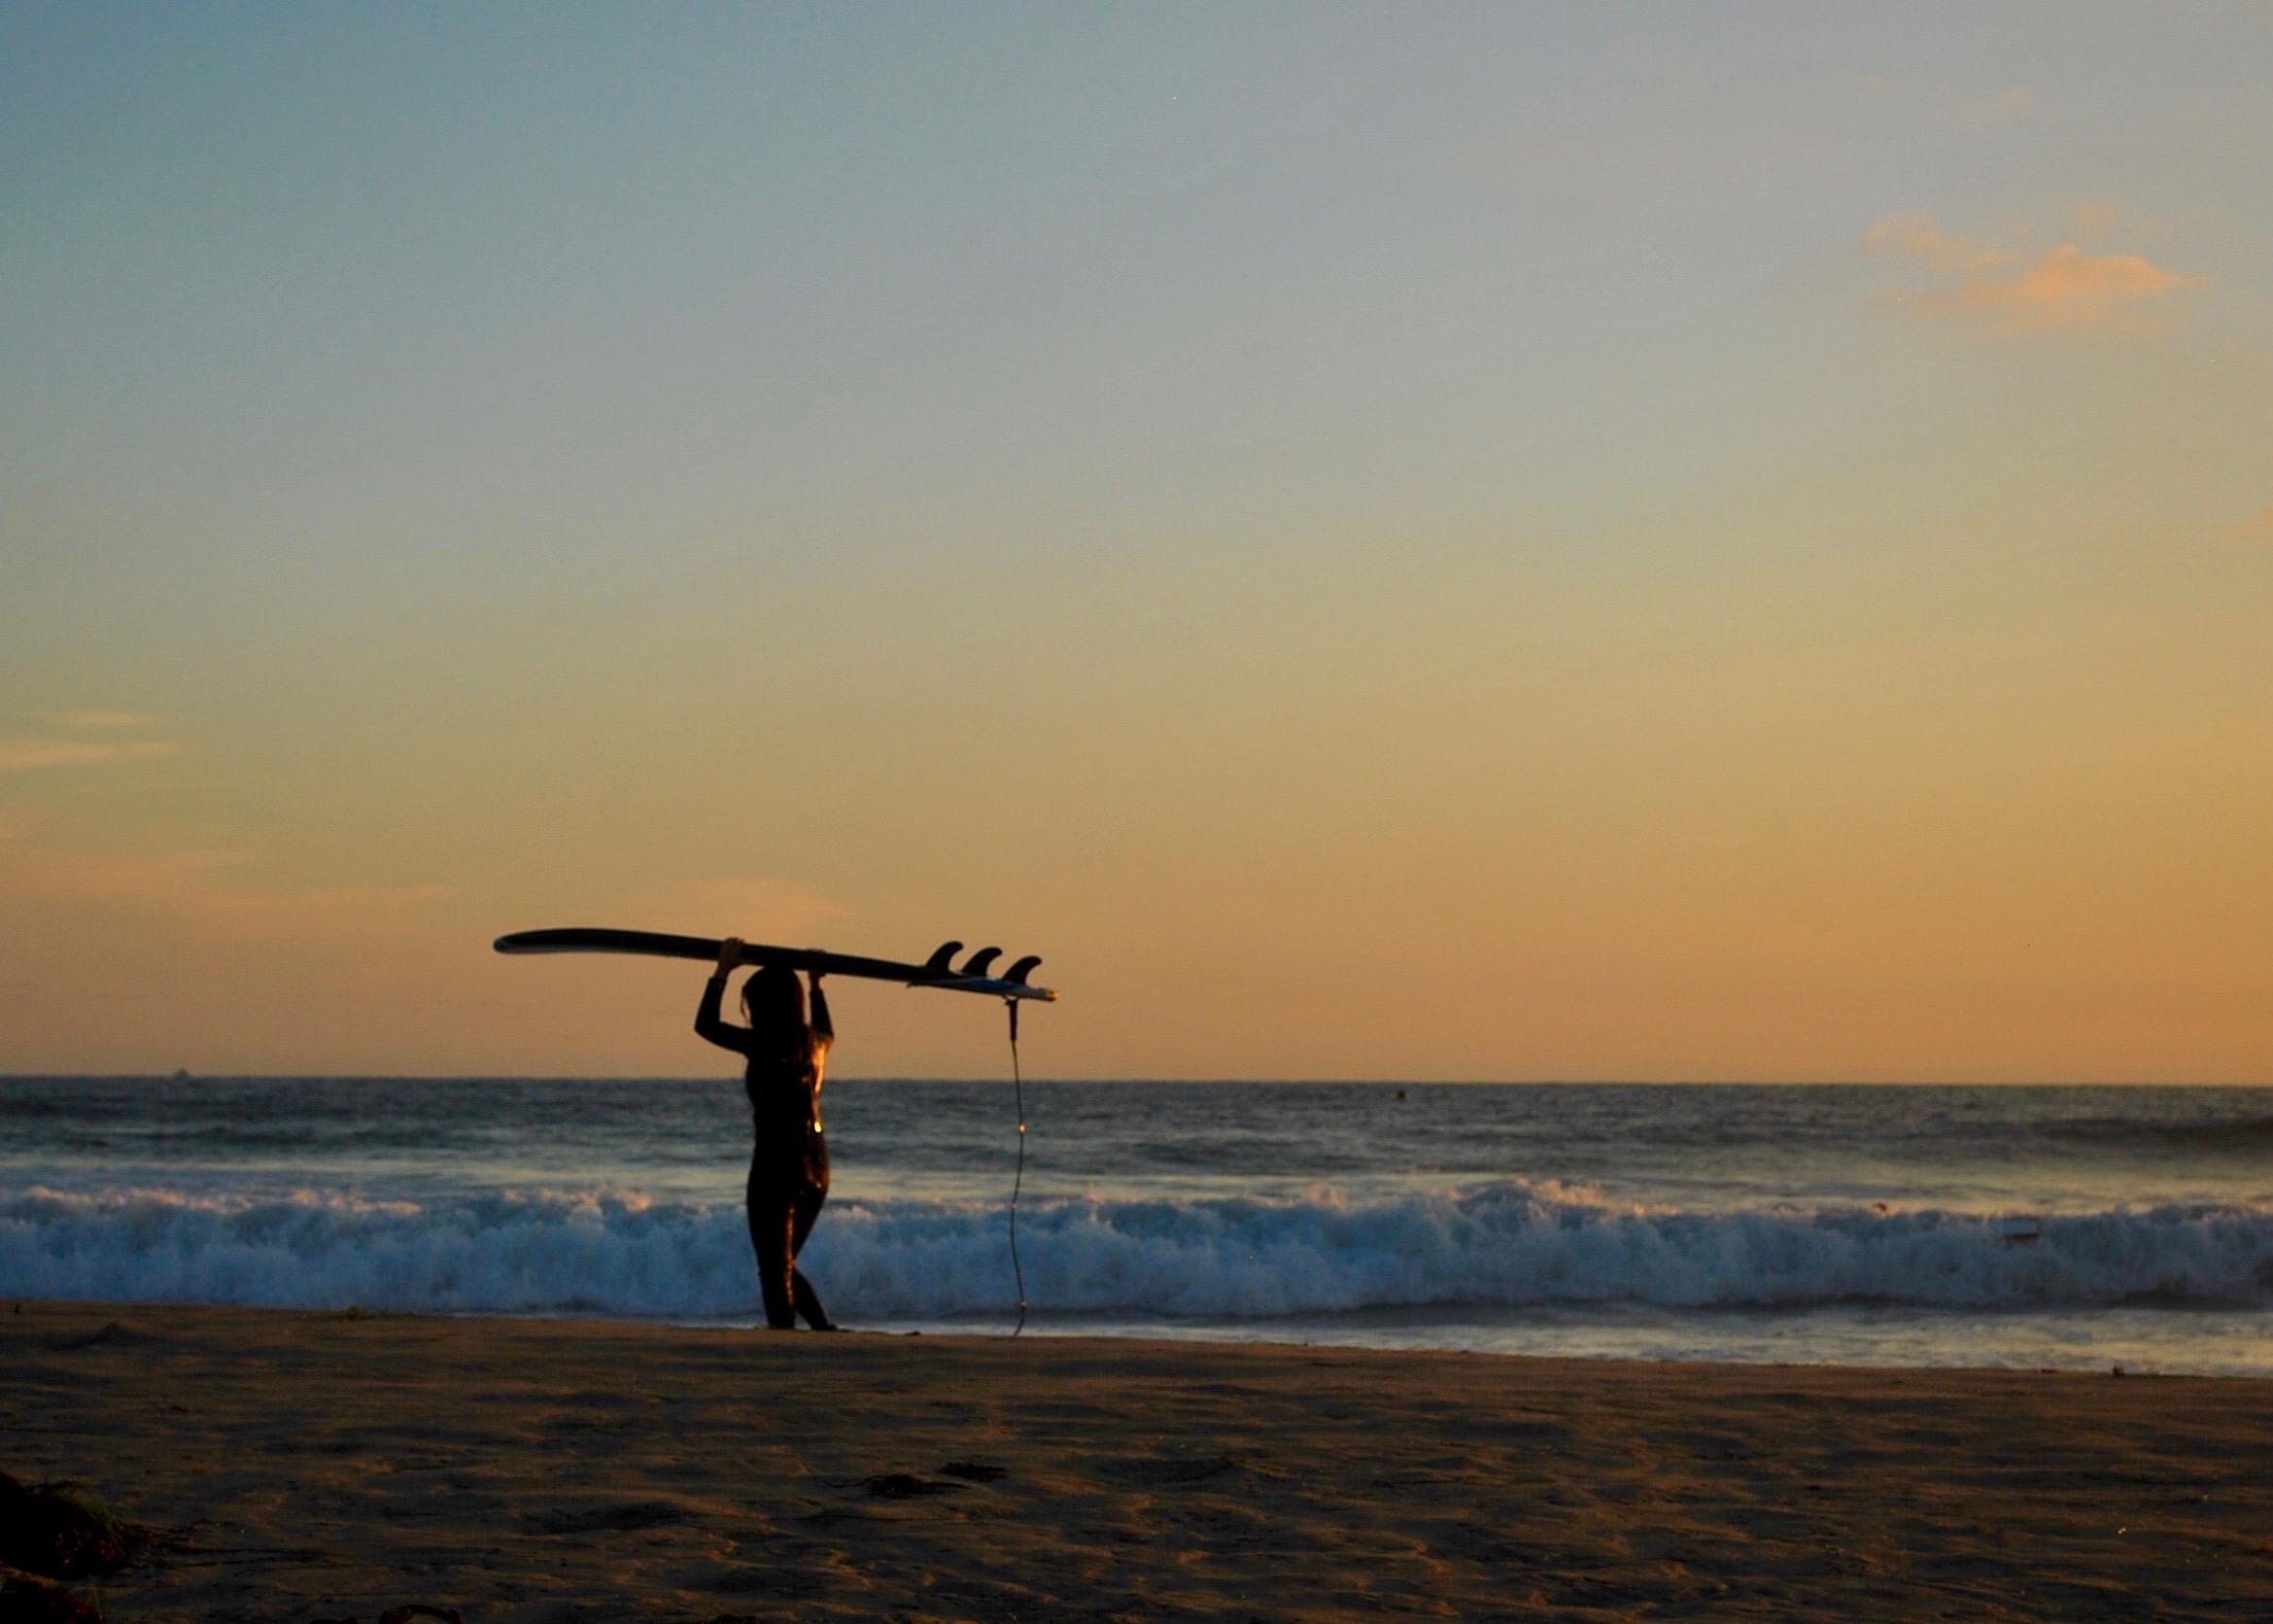 Striking Sunset at Mission Beach, San Diego